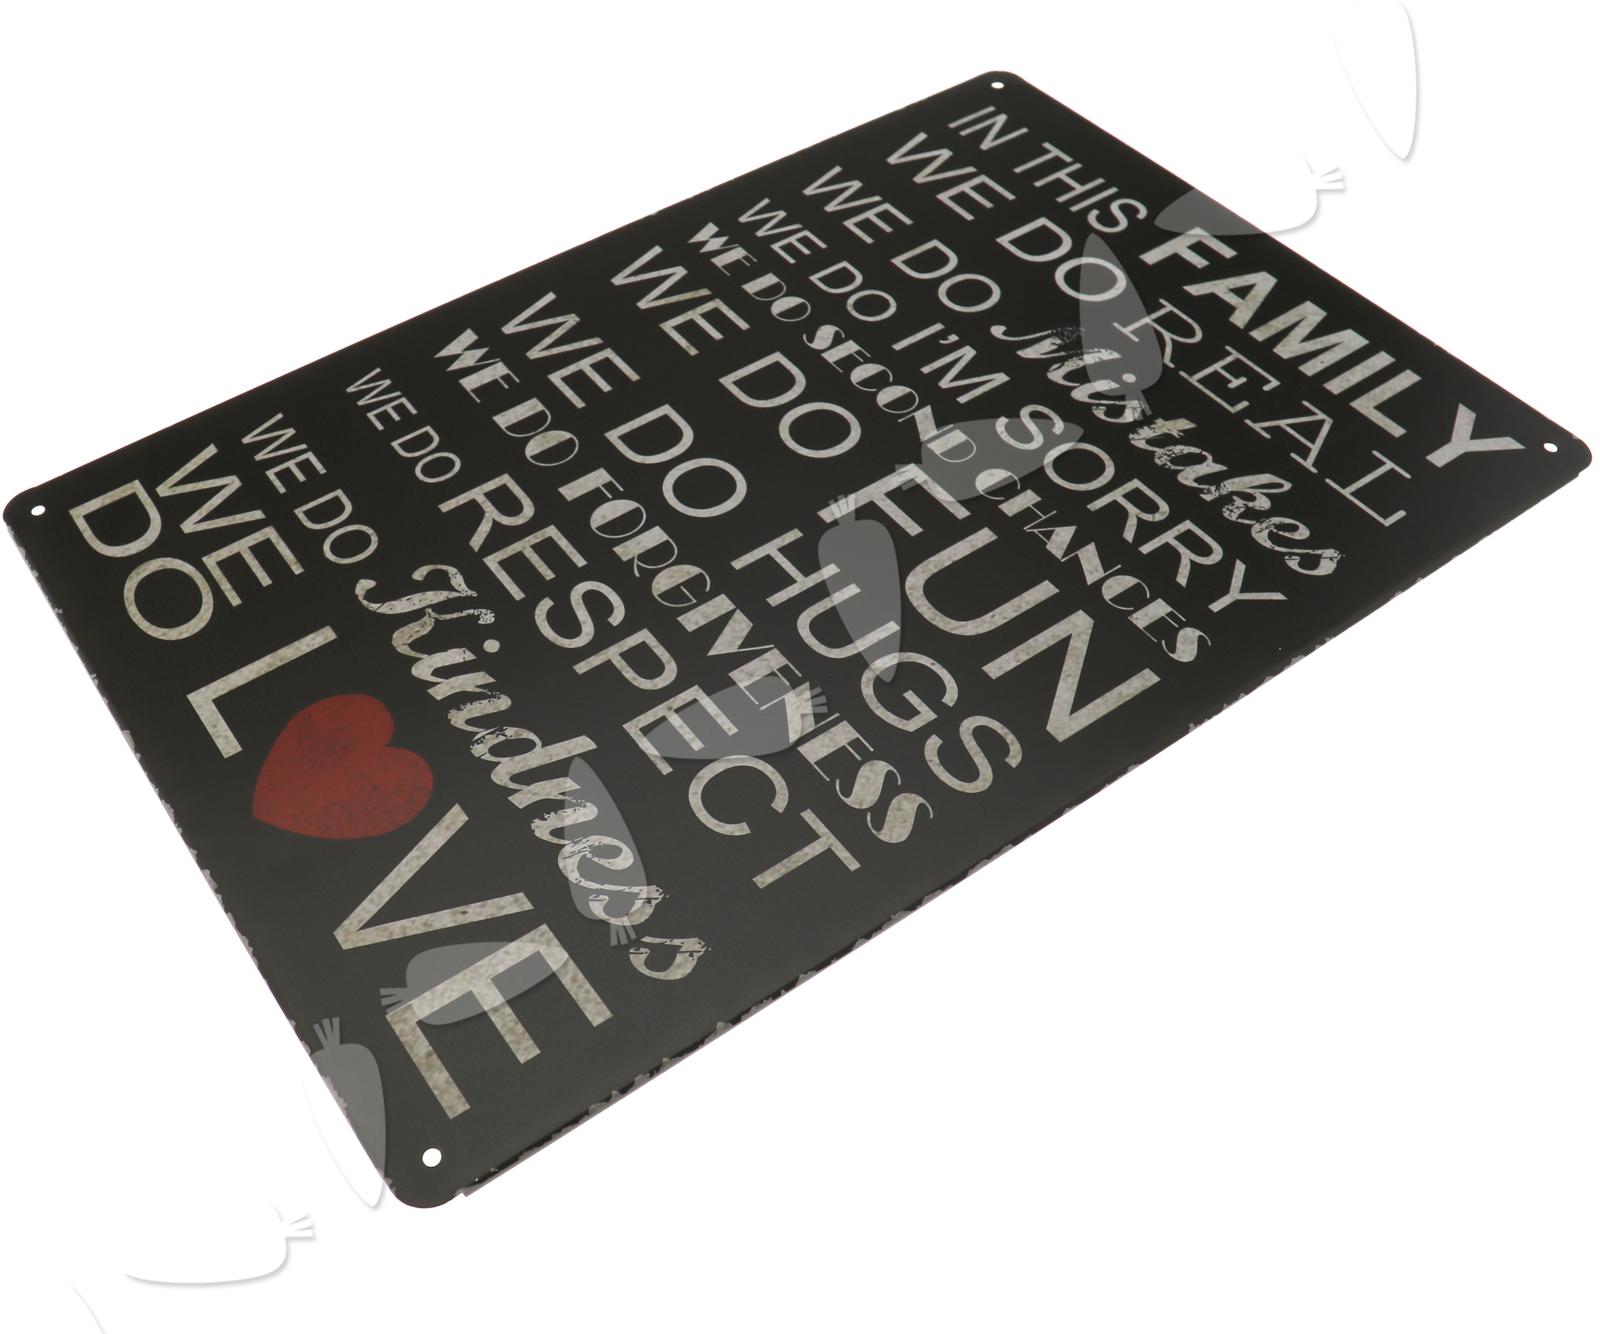 Retro Metal Tin Slogan Sign Plaque Poster Home Club Caffe Pub Wall ...